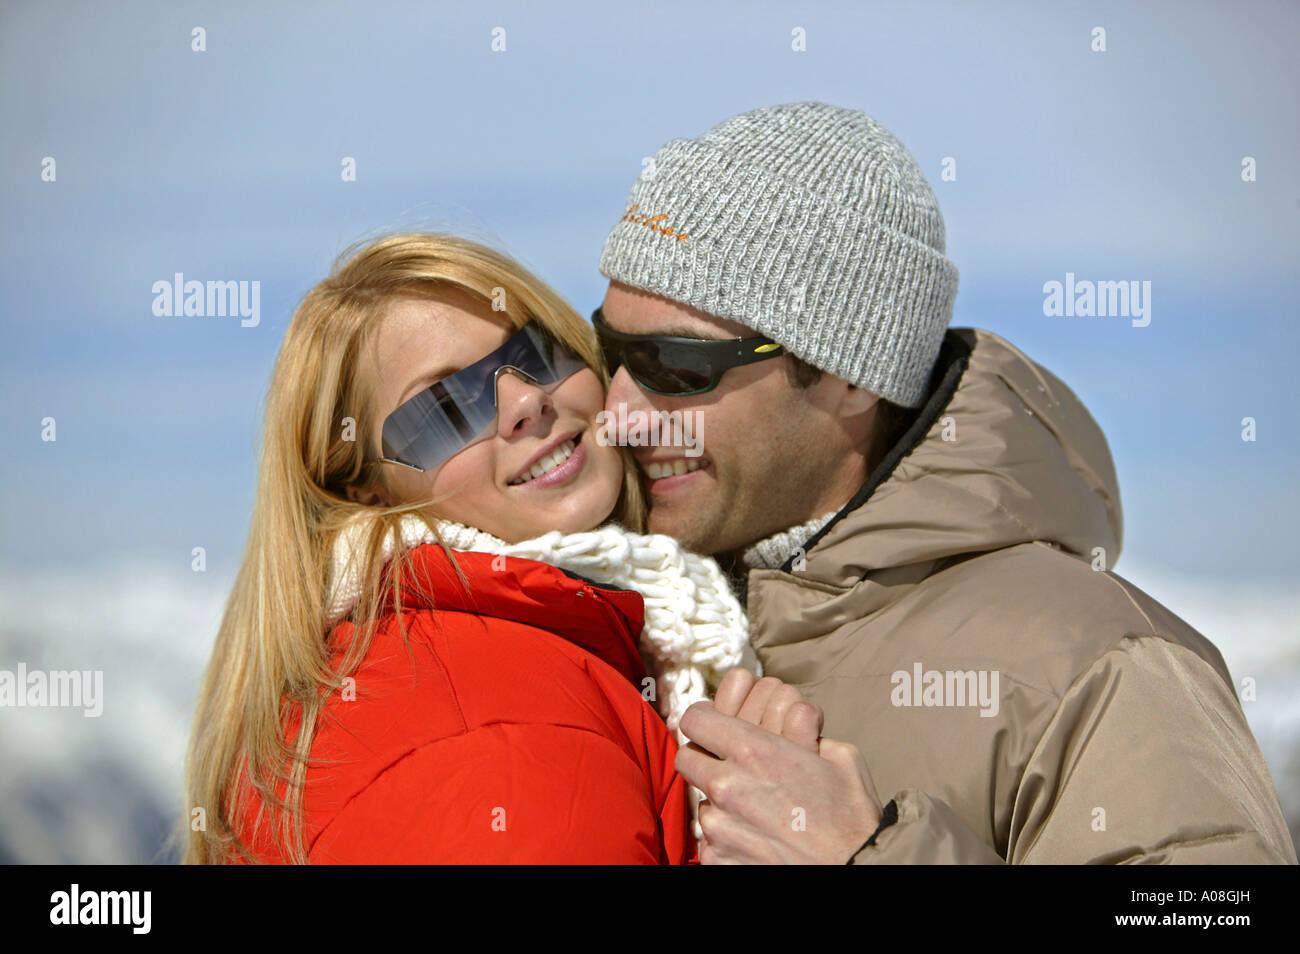 Verliebtes Paar Hat Spass Im Winter Couple In Love In Mountains